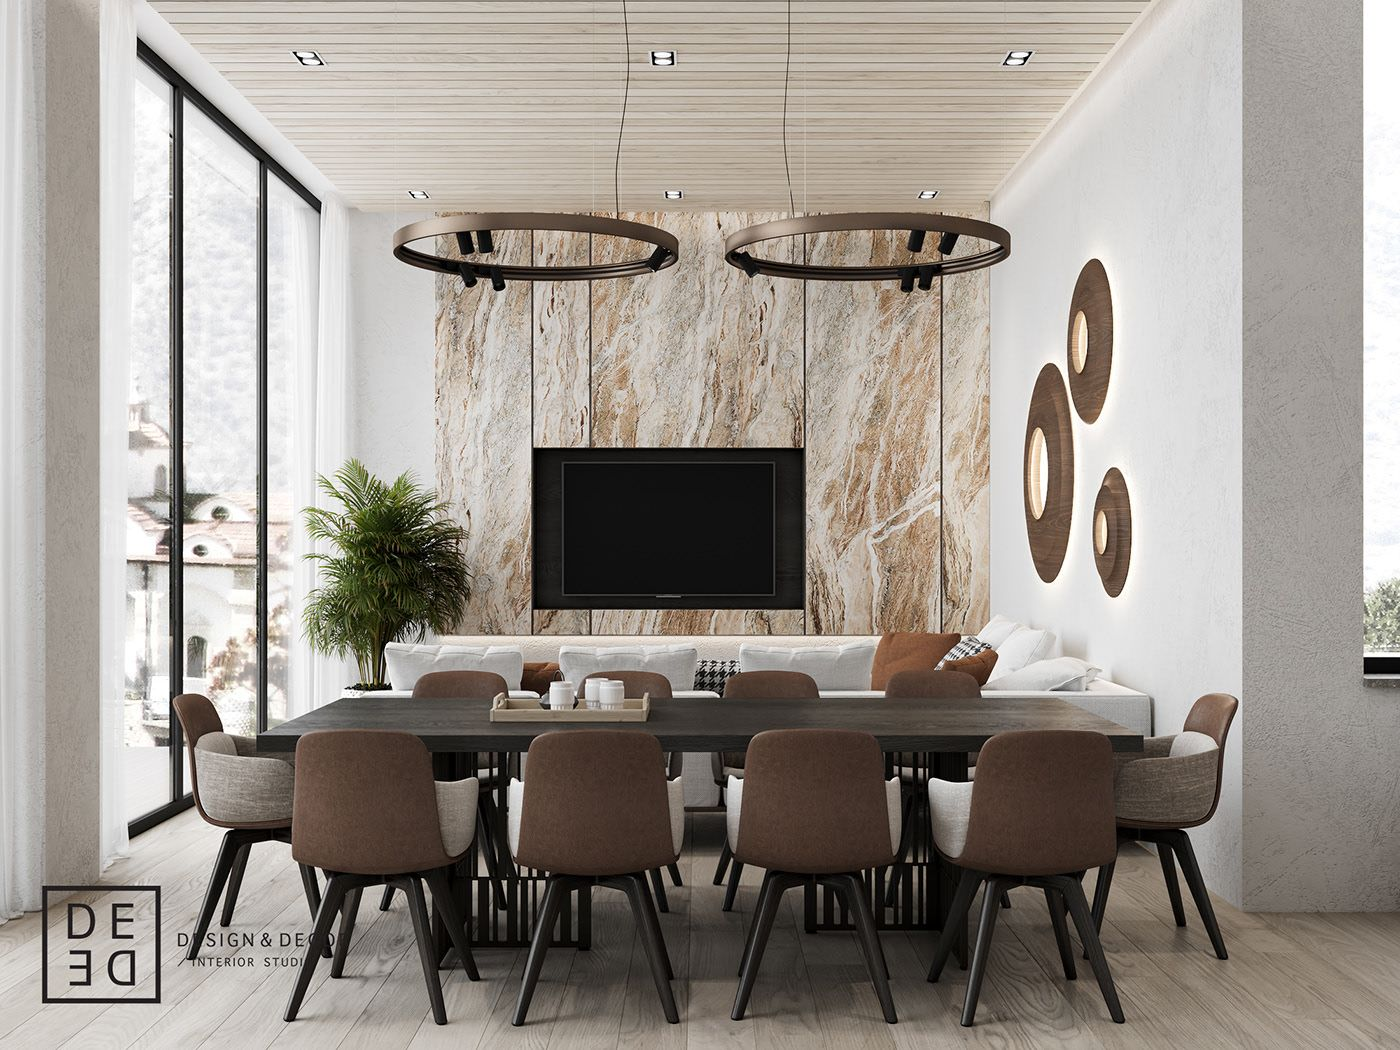 De De Villa On Cyprus First Floor On Behance Office Interior